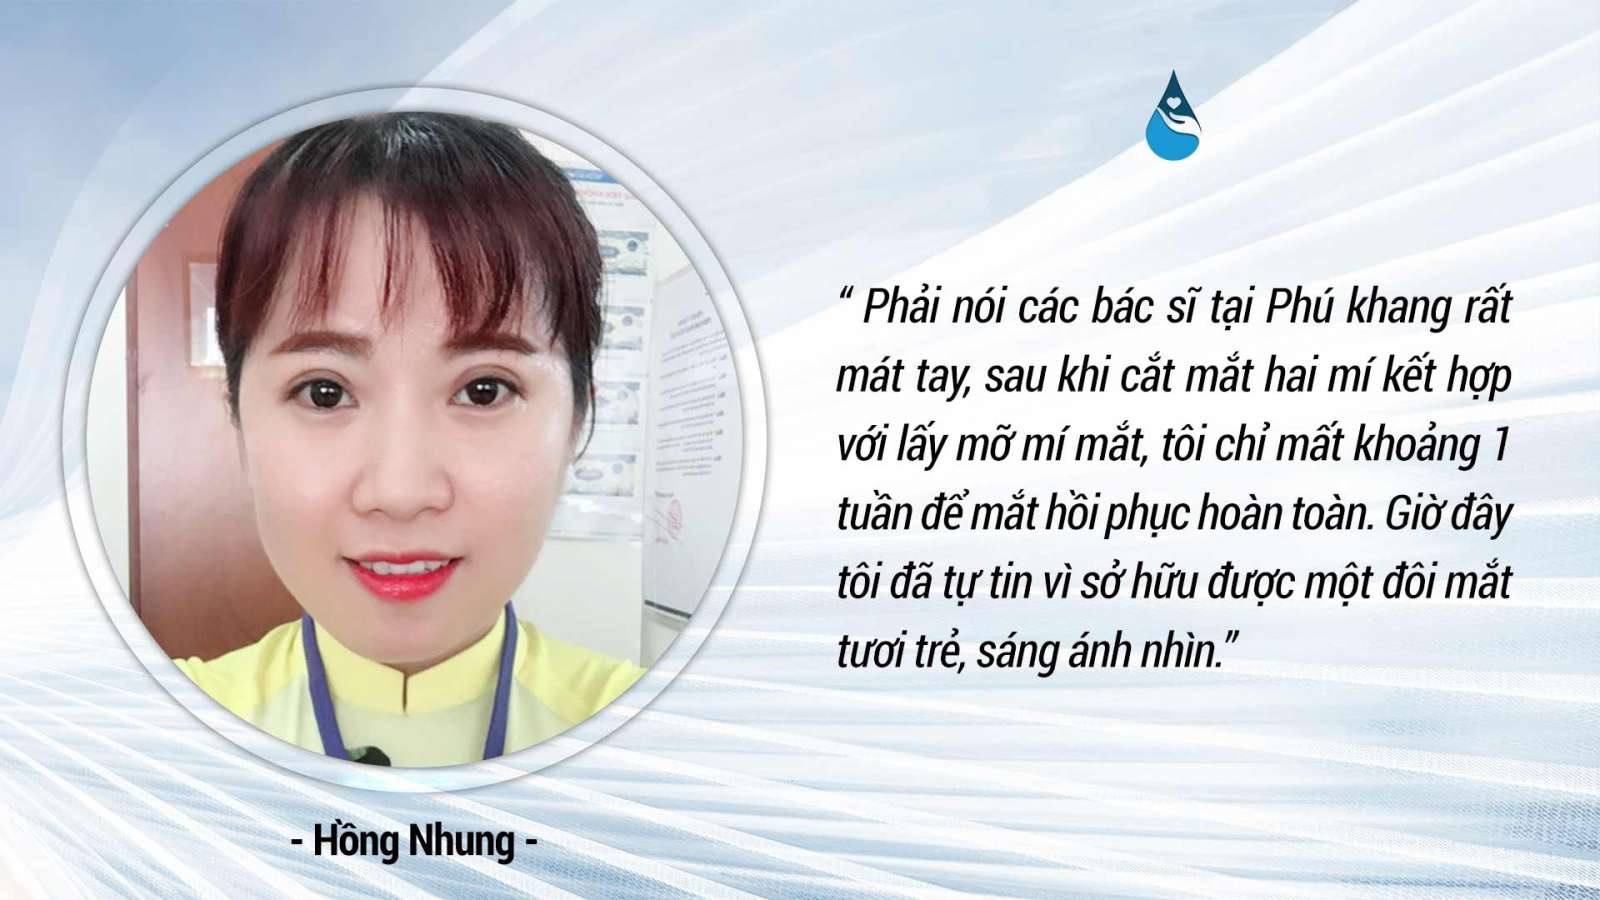 phan-hoi-cua-khach-hang-lay-mo-bong-mat-2